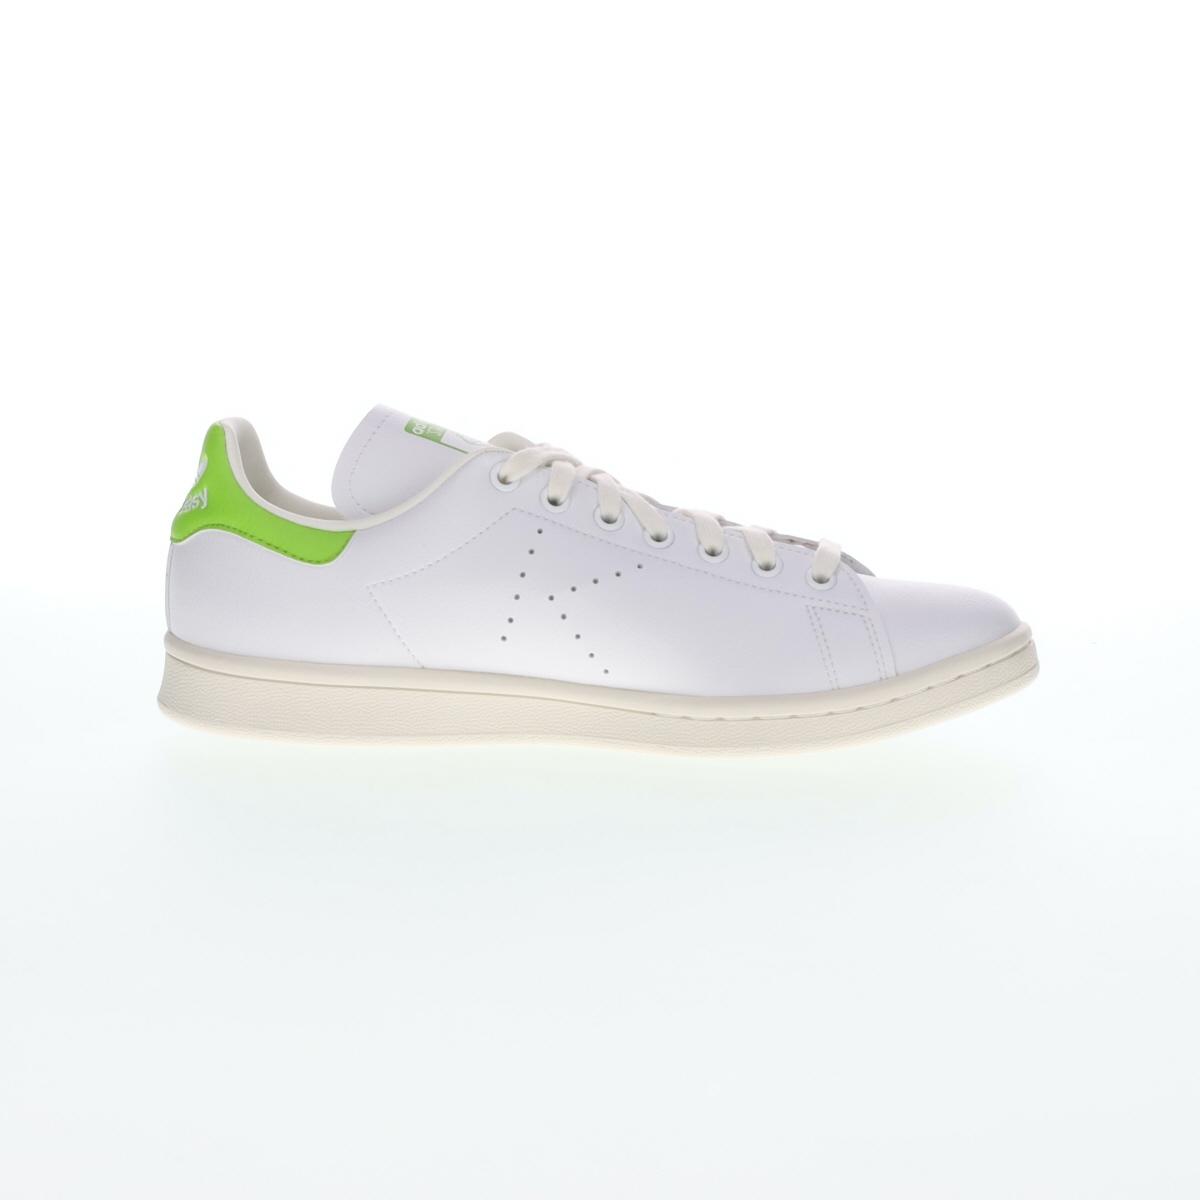 adidas asmc barricade court shoe outlet sale